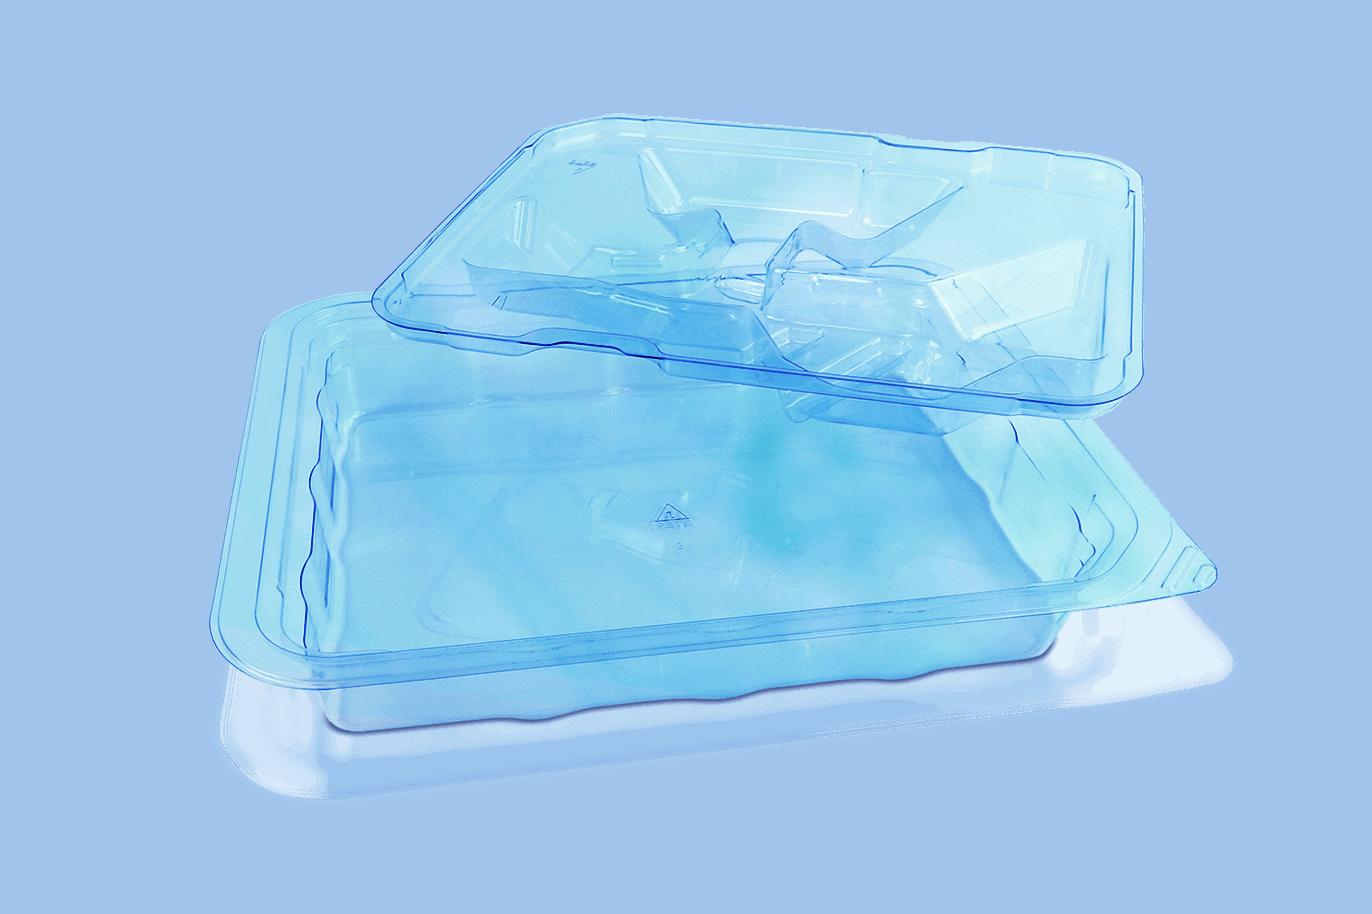 Blue PETG Medical Device Tray